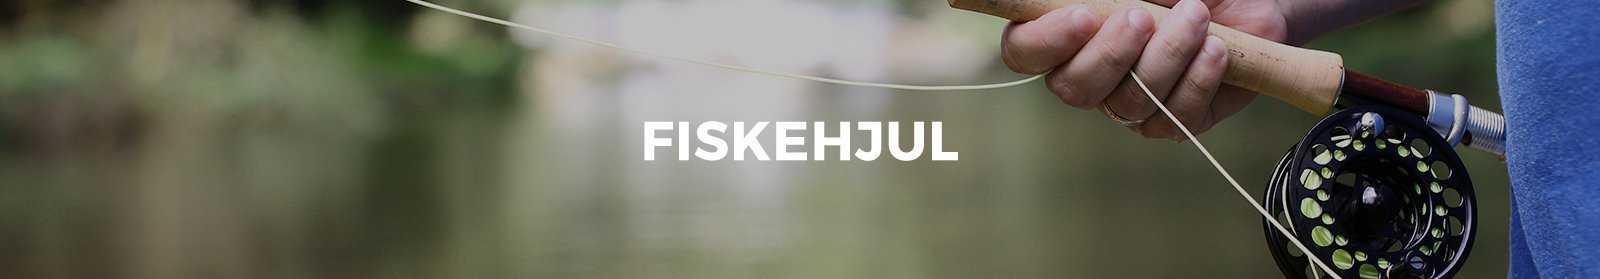 Fiskehjul online